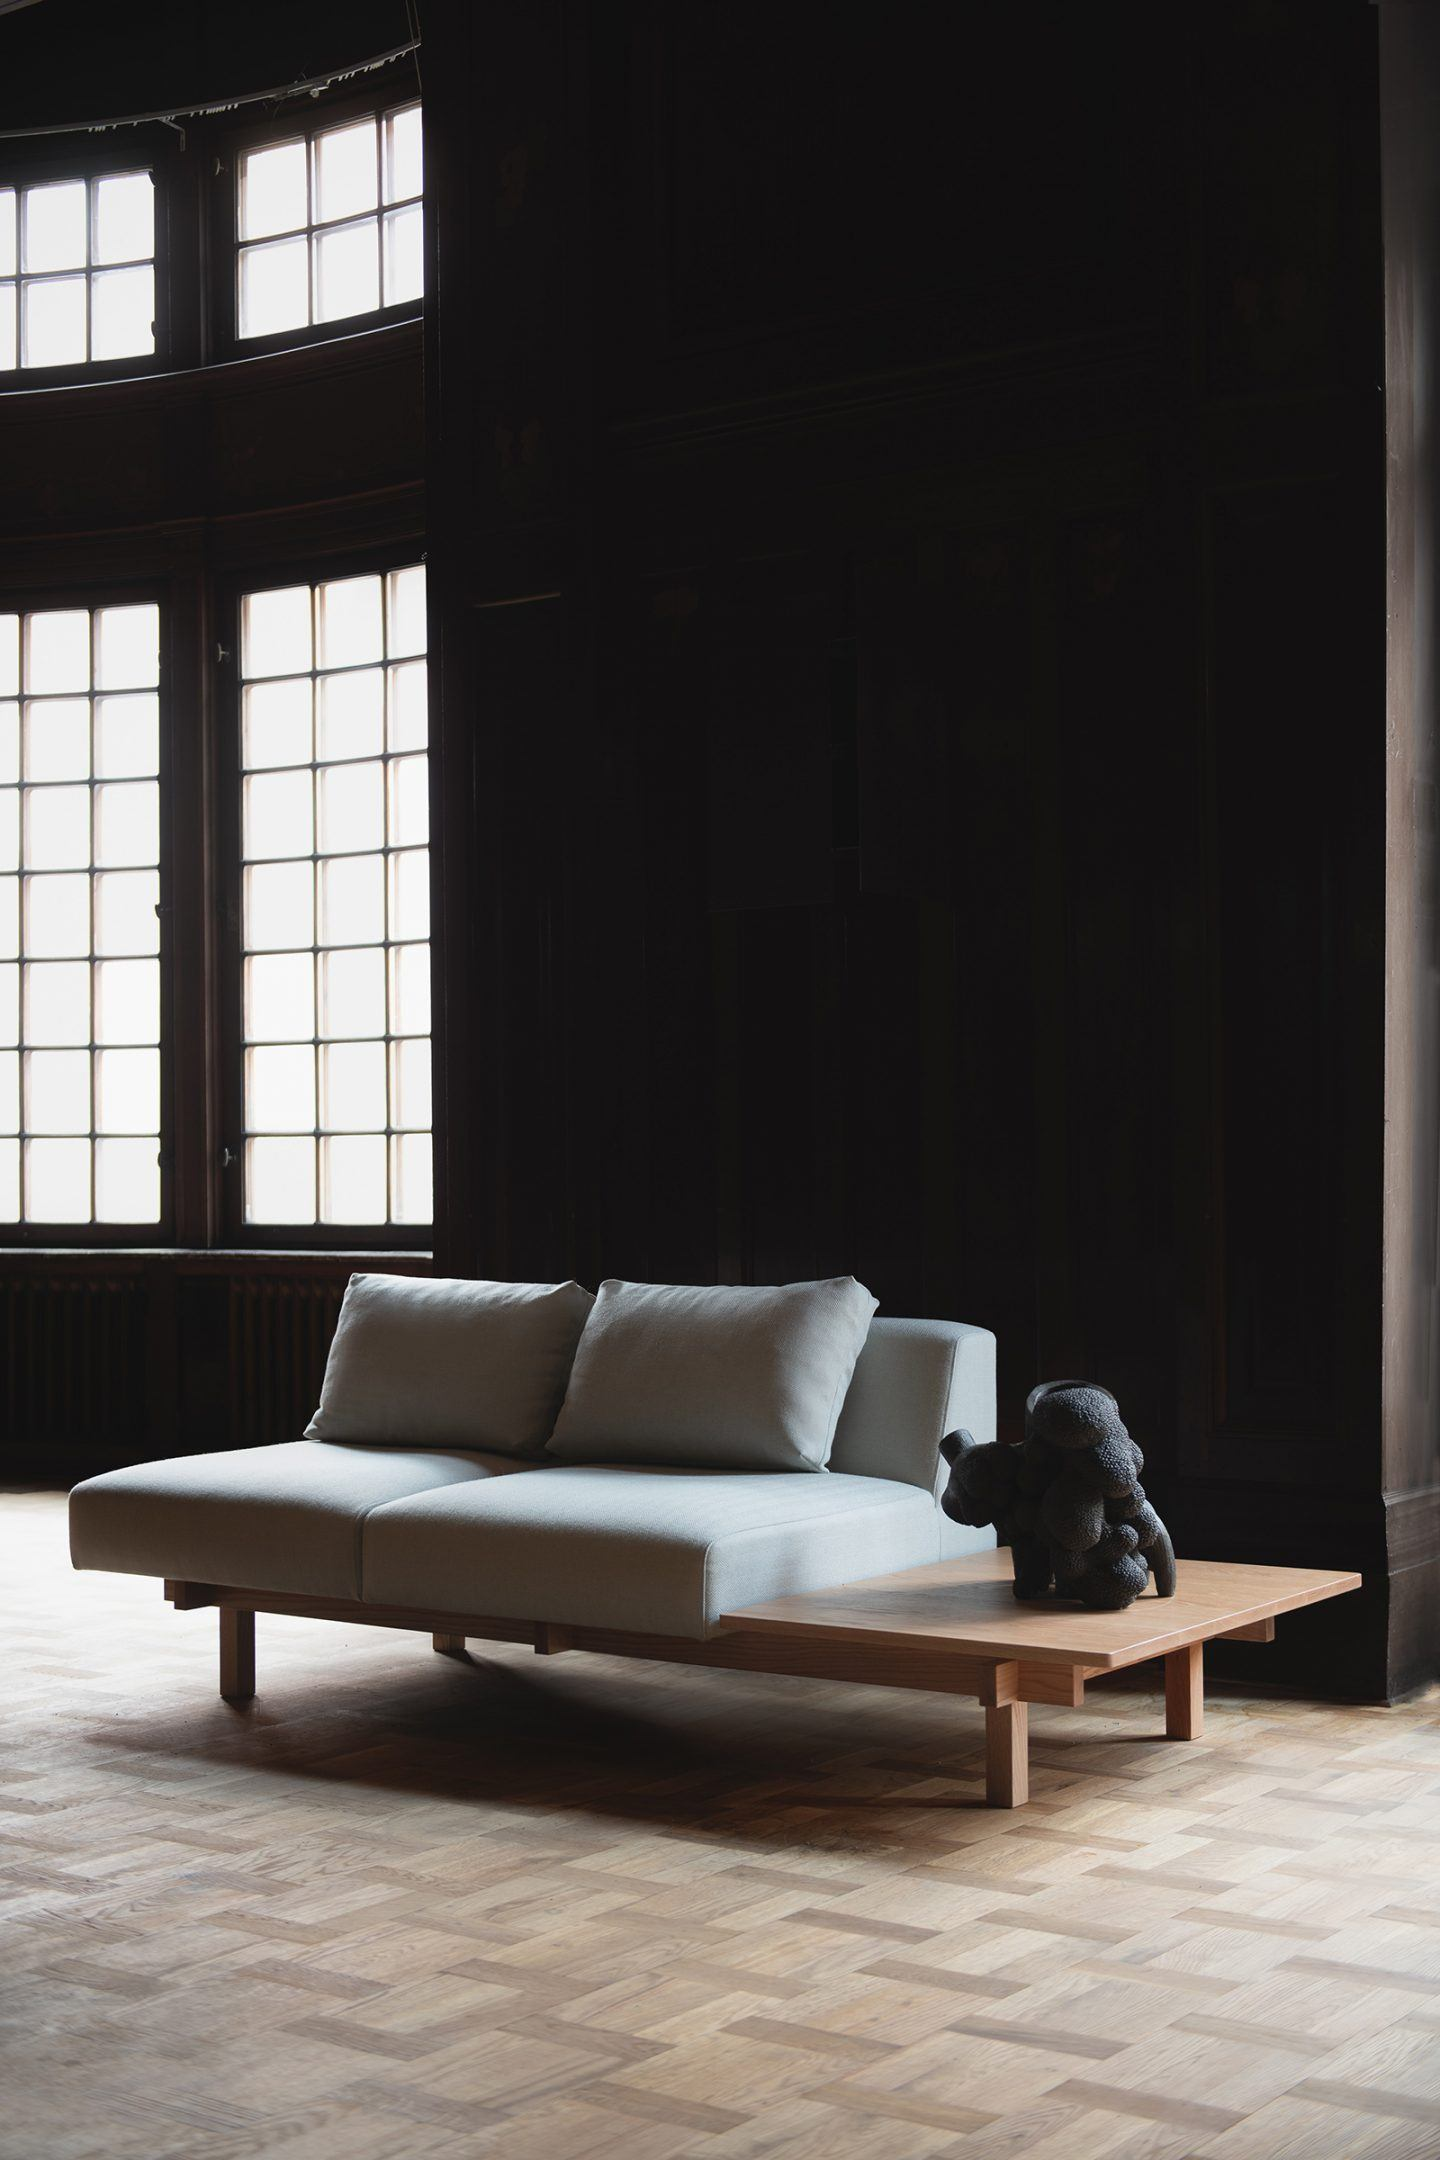 IGNANT-Design-Keiji-Ashizawa-Raft-Sofa-1